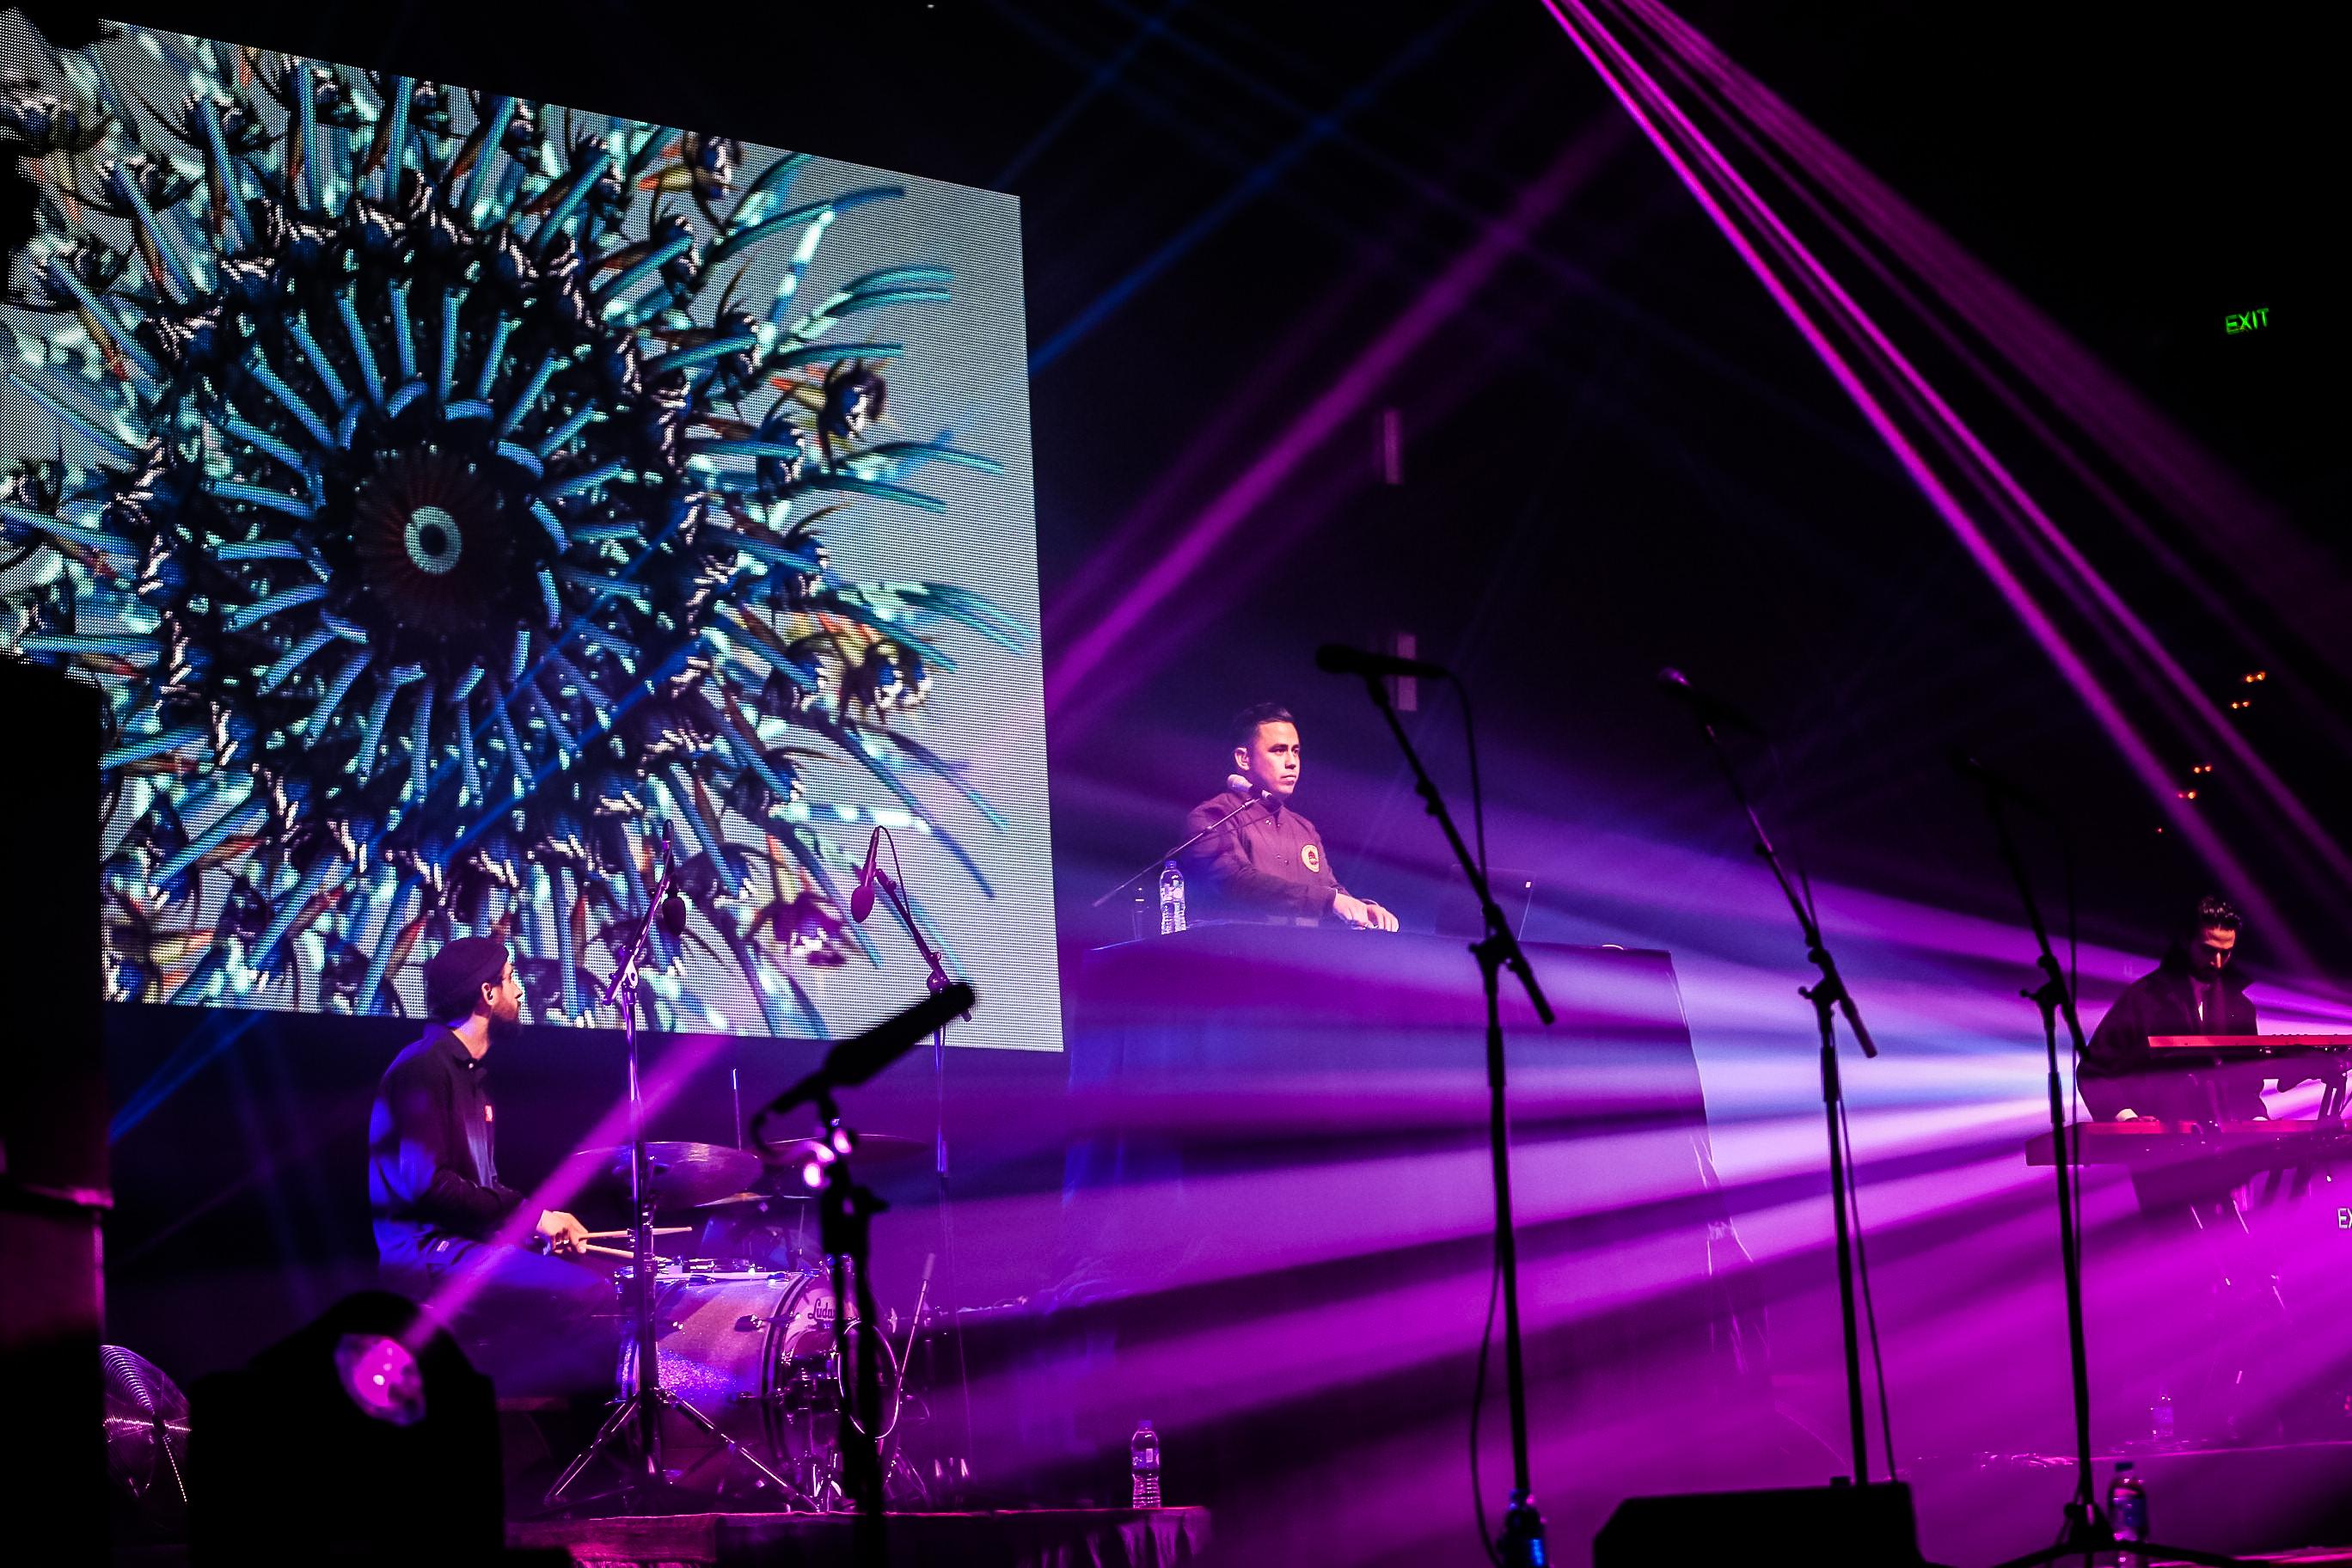 FBi Presents: Ta-ku at Sydney Opera House for Vivid LIVE | 3.6.16 | Photo by Satsuki Minoda